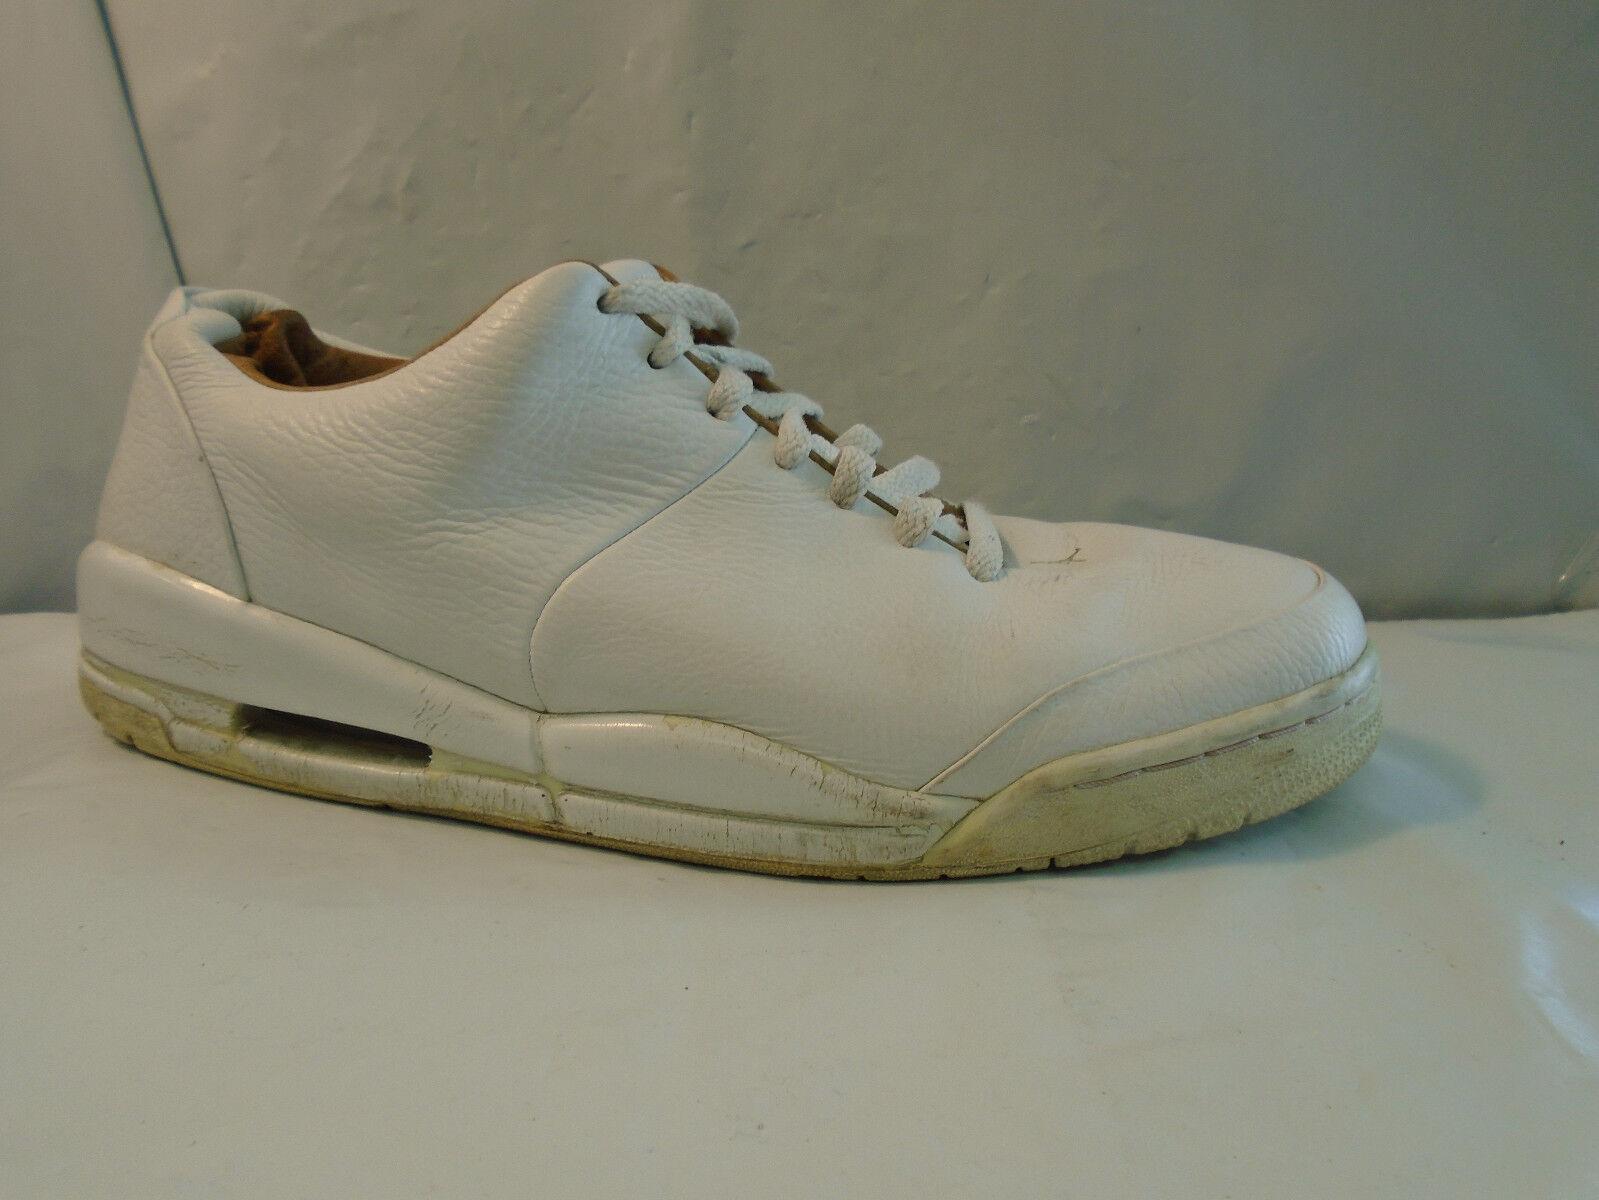 36cb6abf85cfb7 ... Air Jordan 23 Classic Men s White Leather Athletic Shoes Men s Classic  Size 12 M 313480- ...